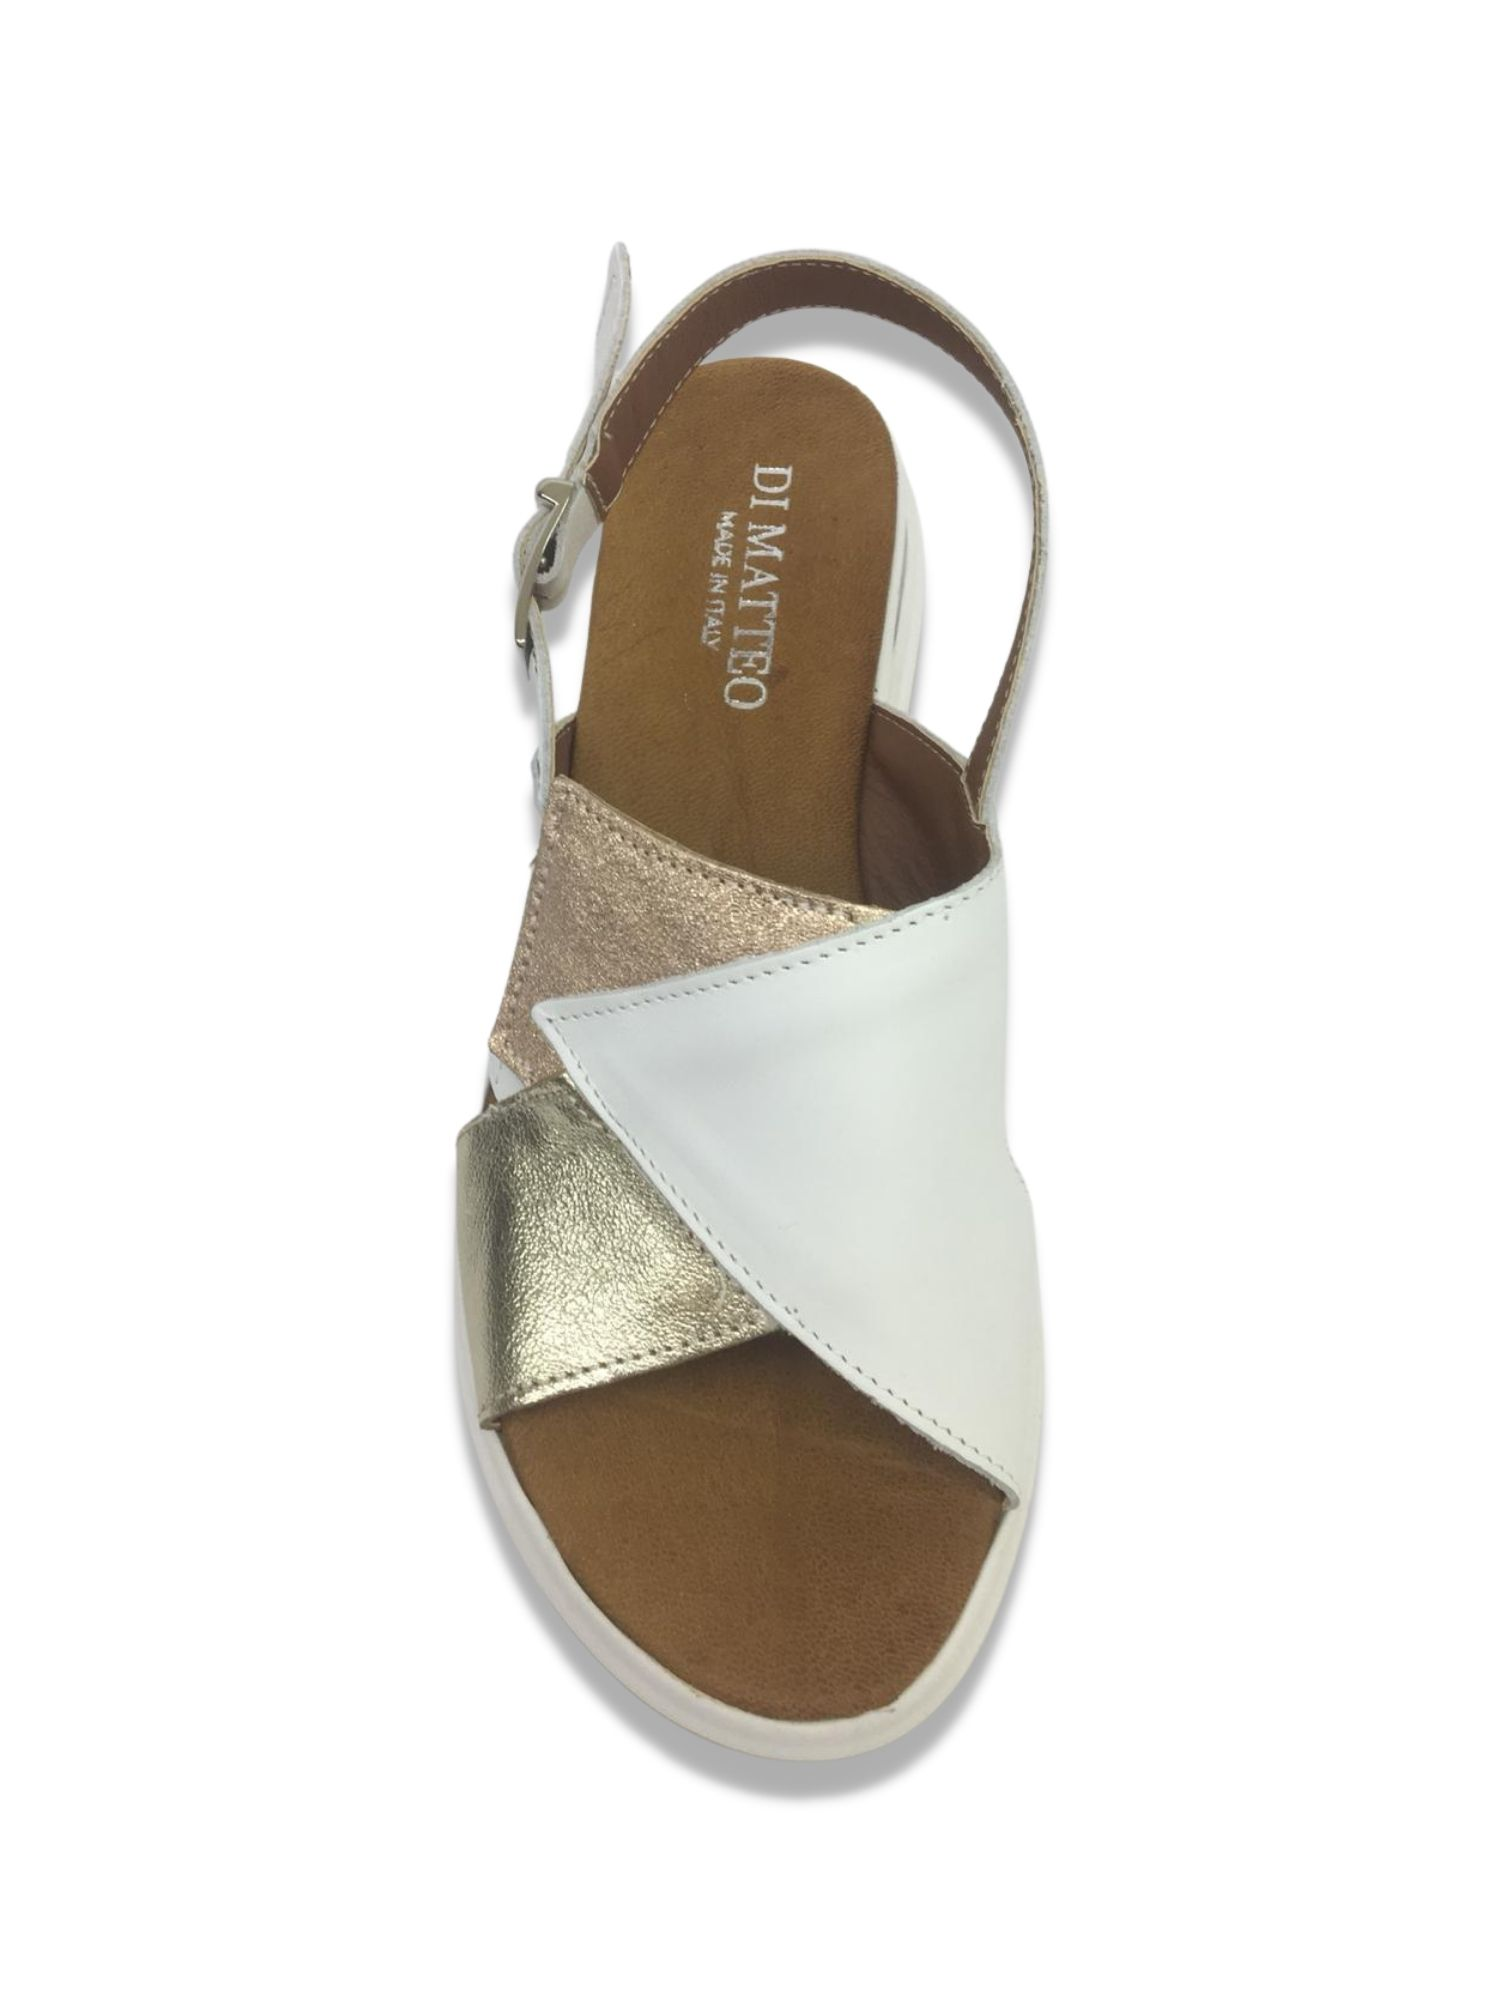 Sandalo Sabot Made in Italy 409 Bianco alto